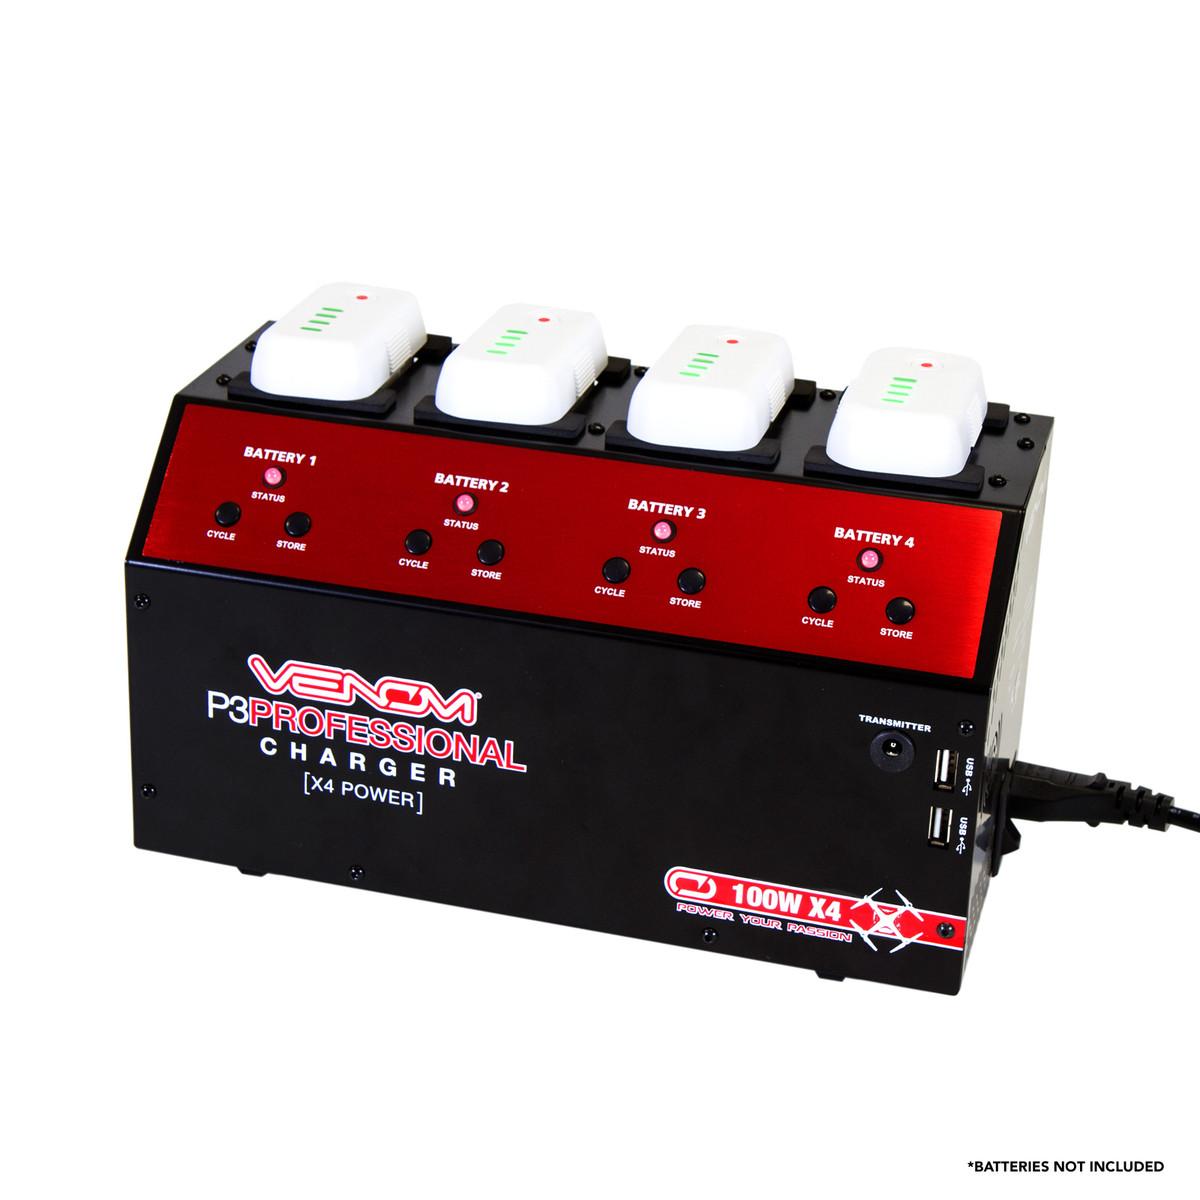 0694 Pro DJI Phantom 3 Quad Battery Charger